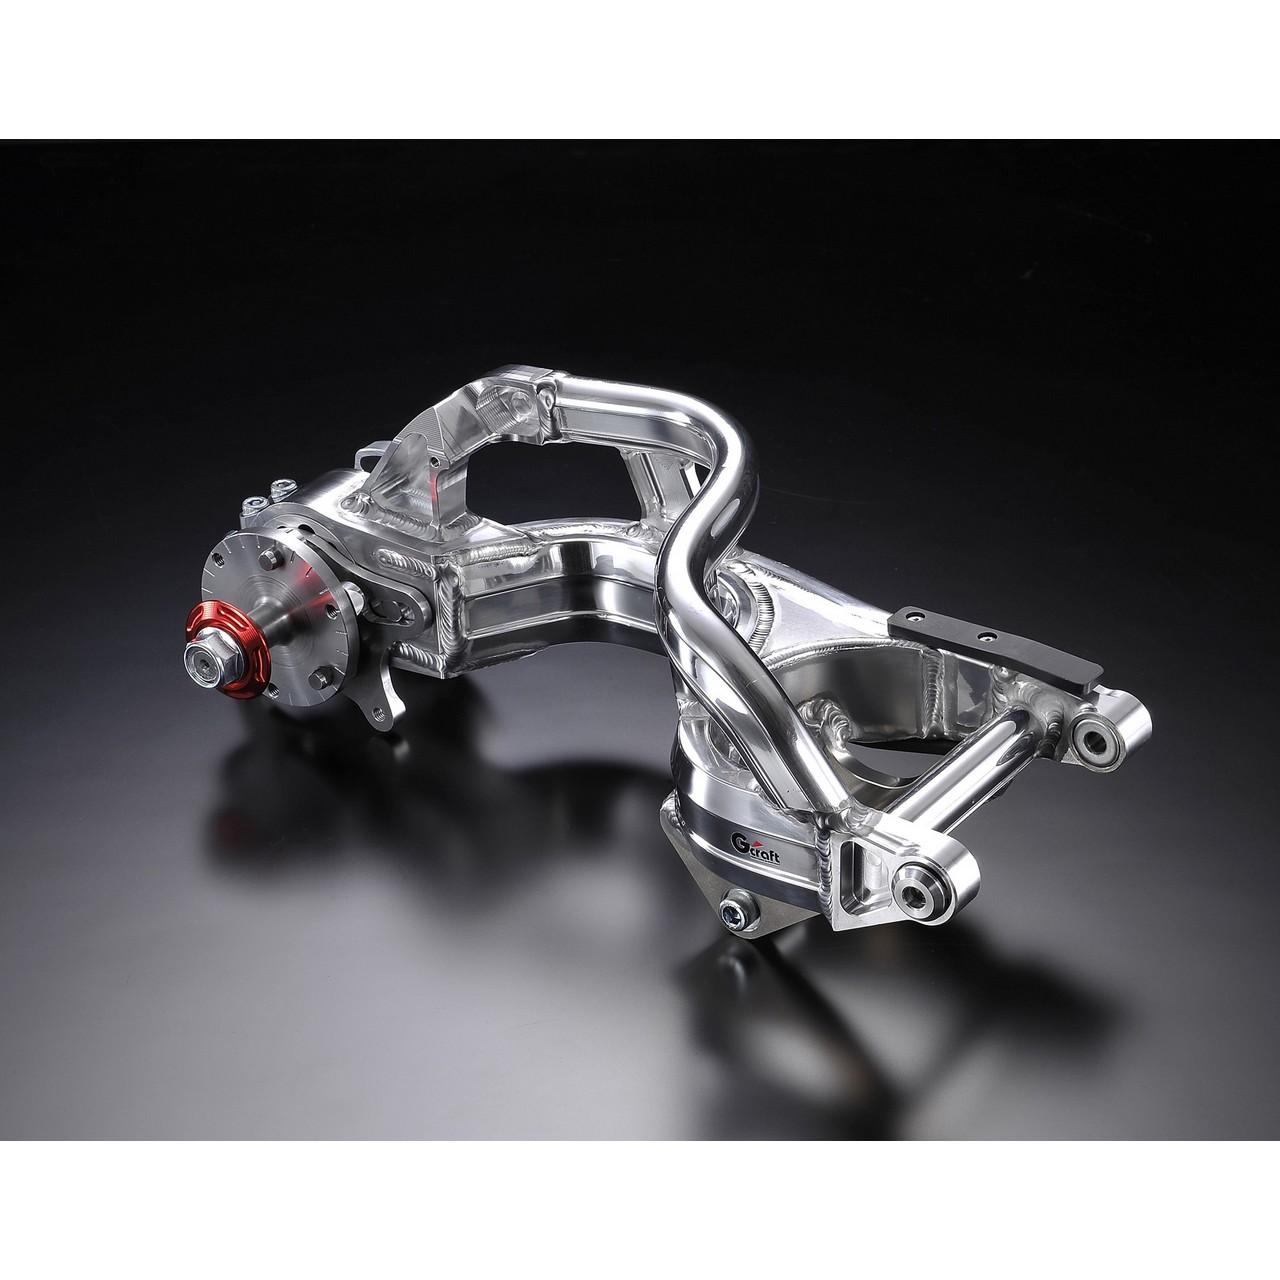 【G-Craft】單邊型後搖臂10英吋4.0J - 「Webike-摩托百貨」